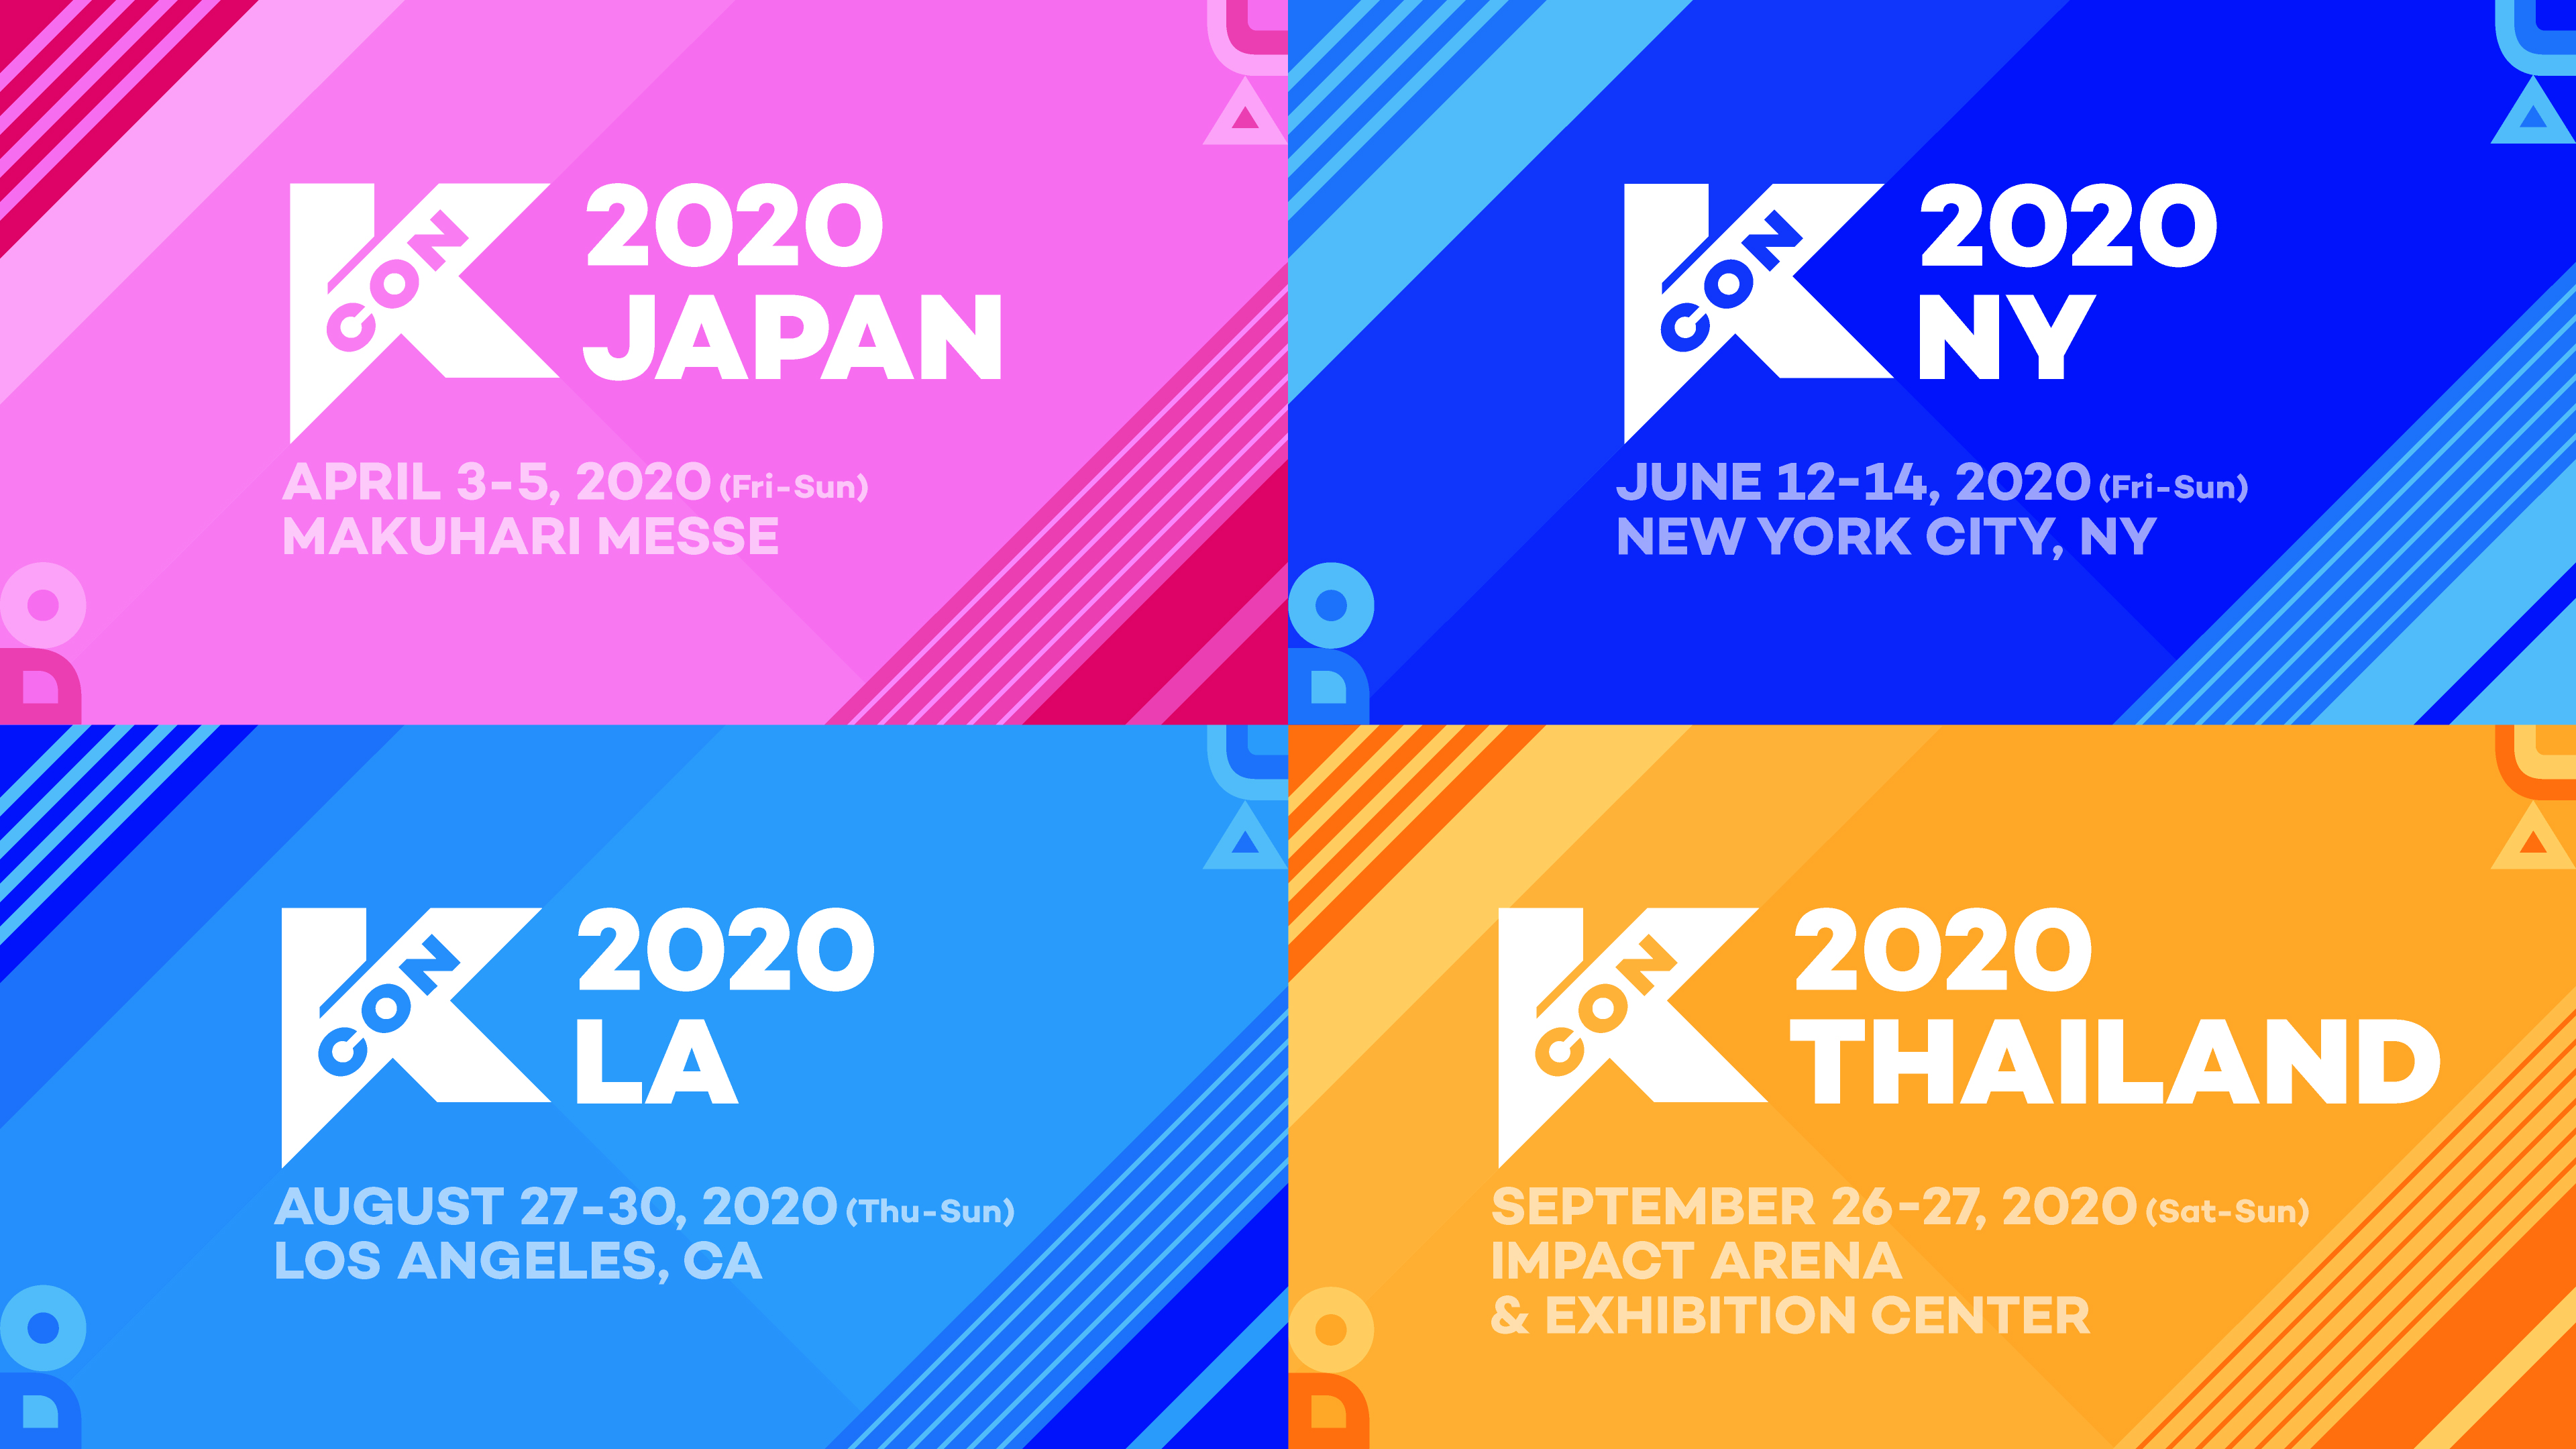 CJ ENM 主催 世界最大級の K Culture フェスティバル『 KCON 2020 』4 月に日本幕張メッセ、6 月・8月にアメリカ(NY、LA)、9 月にタイ(バンコク)で開催決定‼